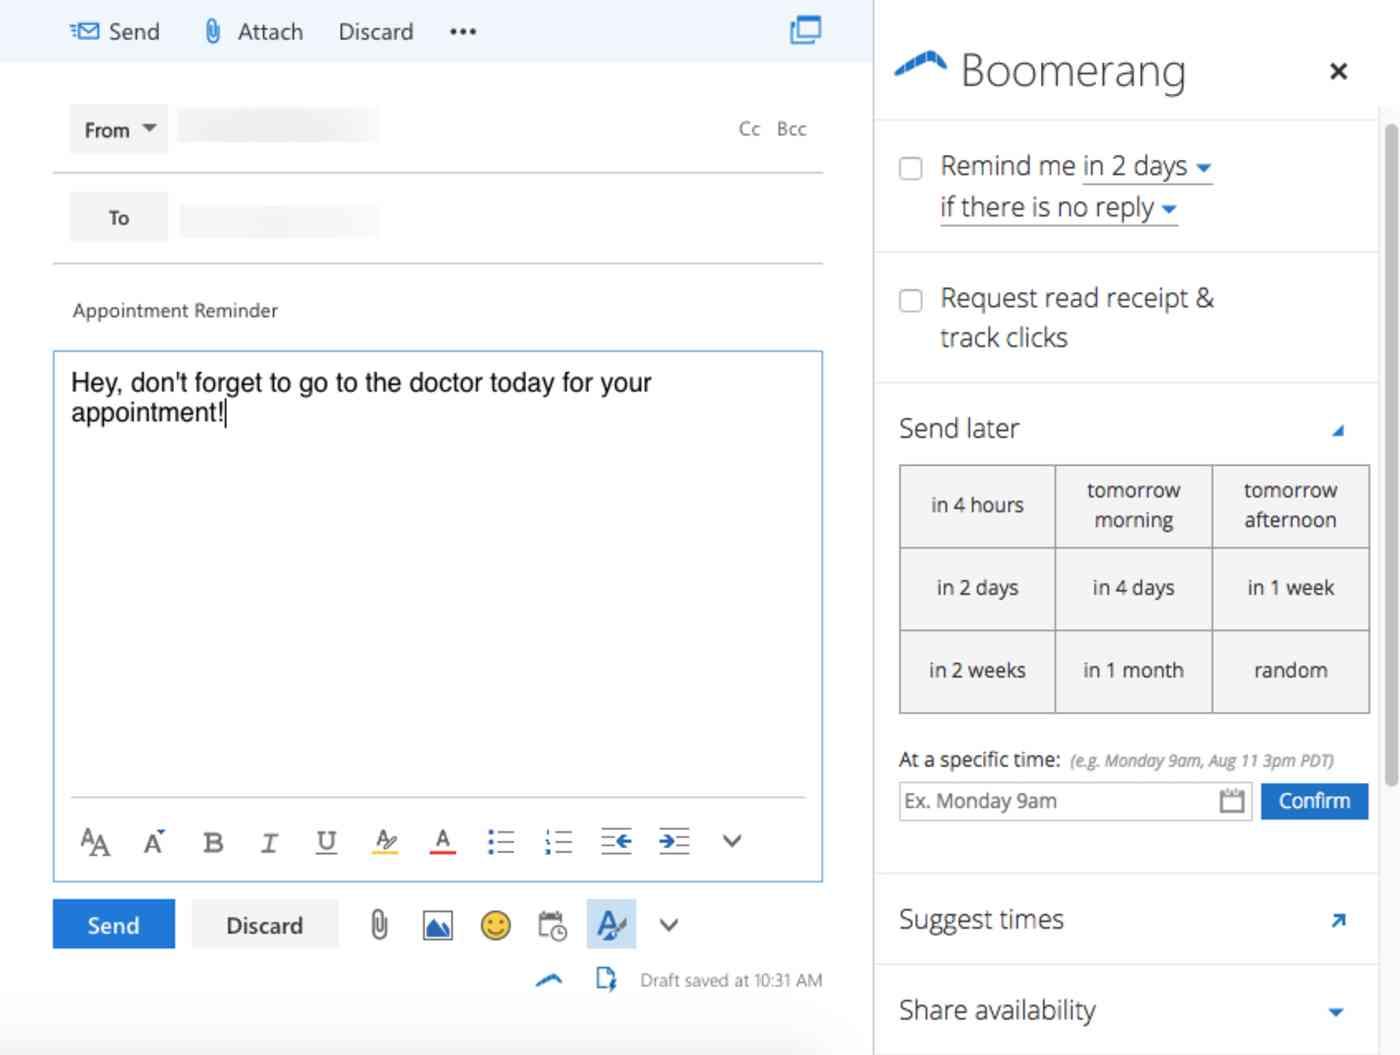 Boomerang Outlook.com Add-in